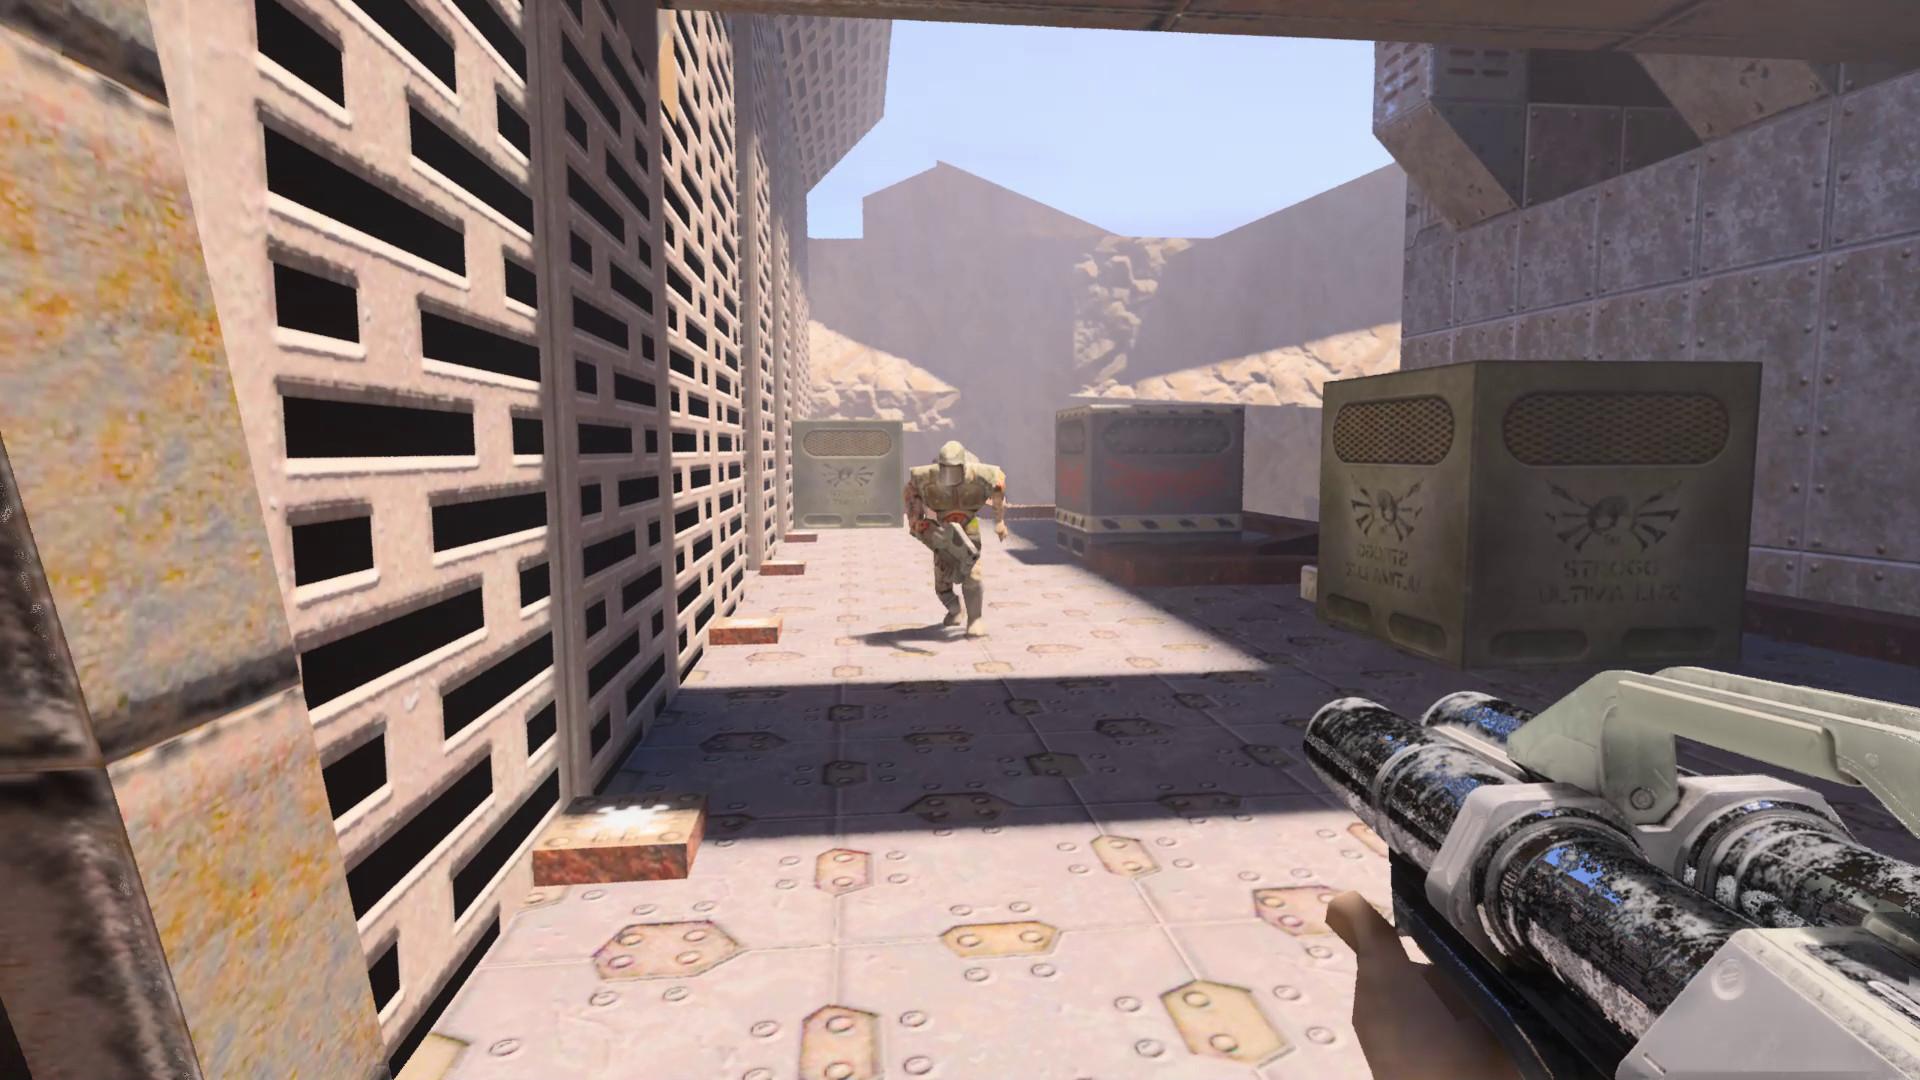 Game Ready Driver da NVIDIA leva Ray tracing a Vulkan e Quake II RTX